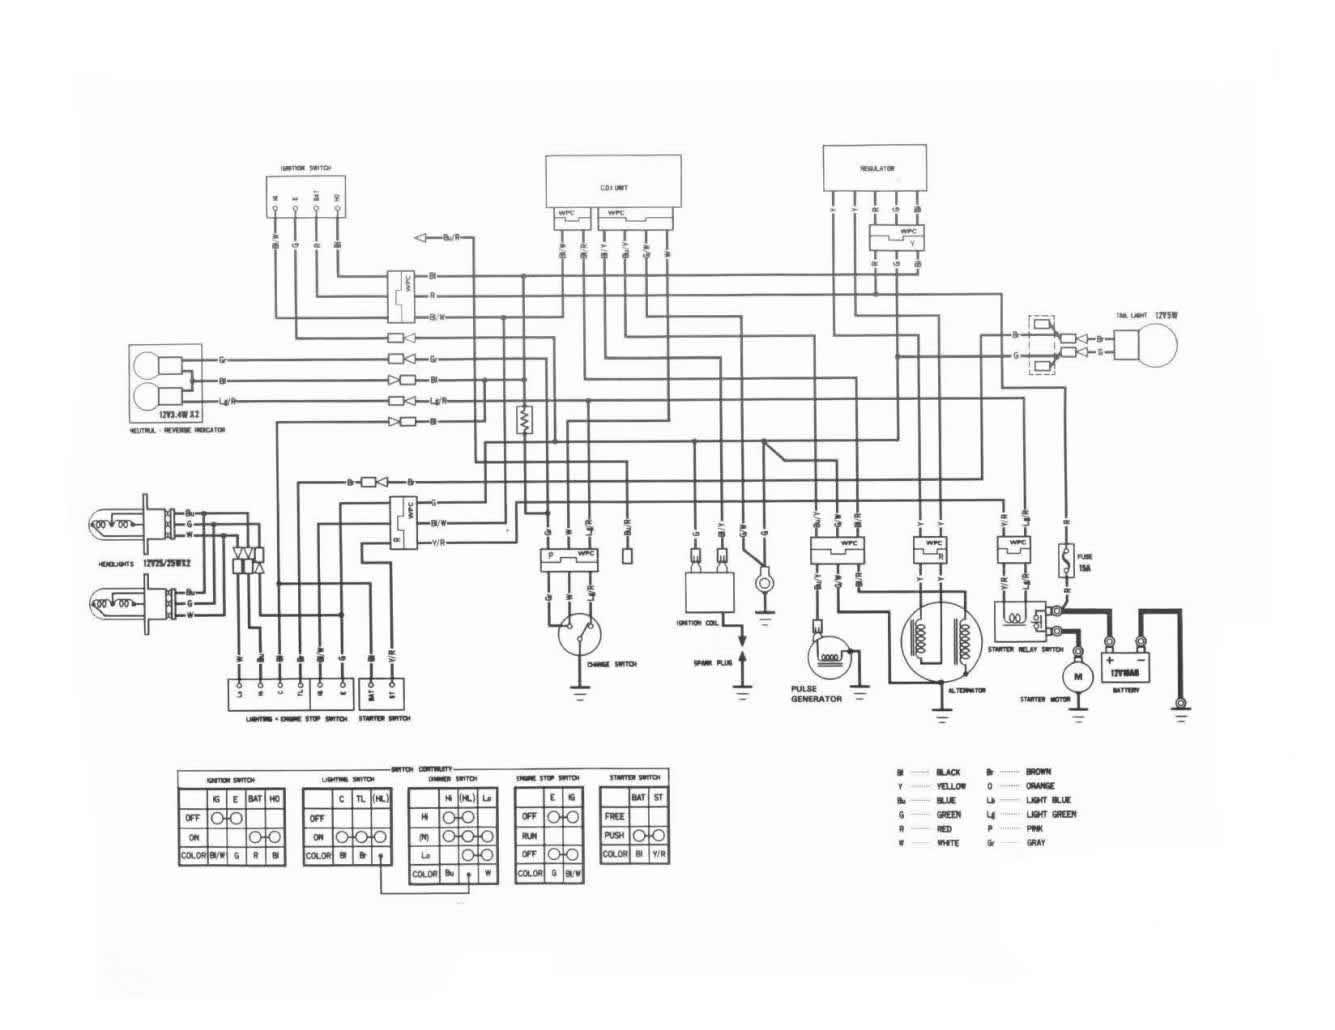 hight resolution of 300 fourtrax wiring diagram data wiring diagrams u2022 rh kwintesencja co honda foreman 500 wiring diagram